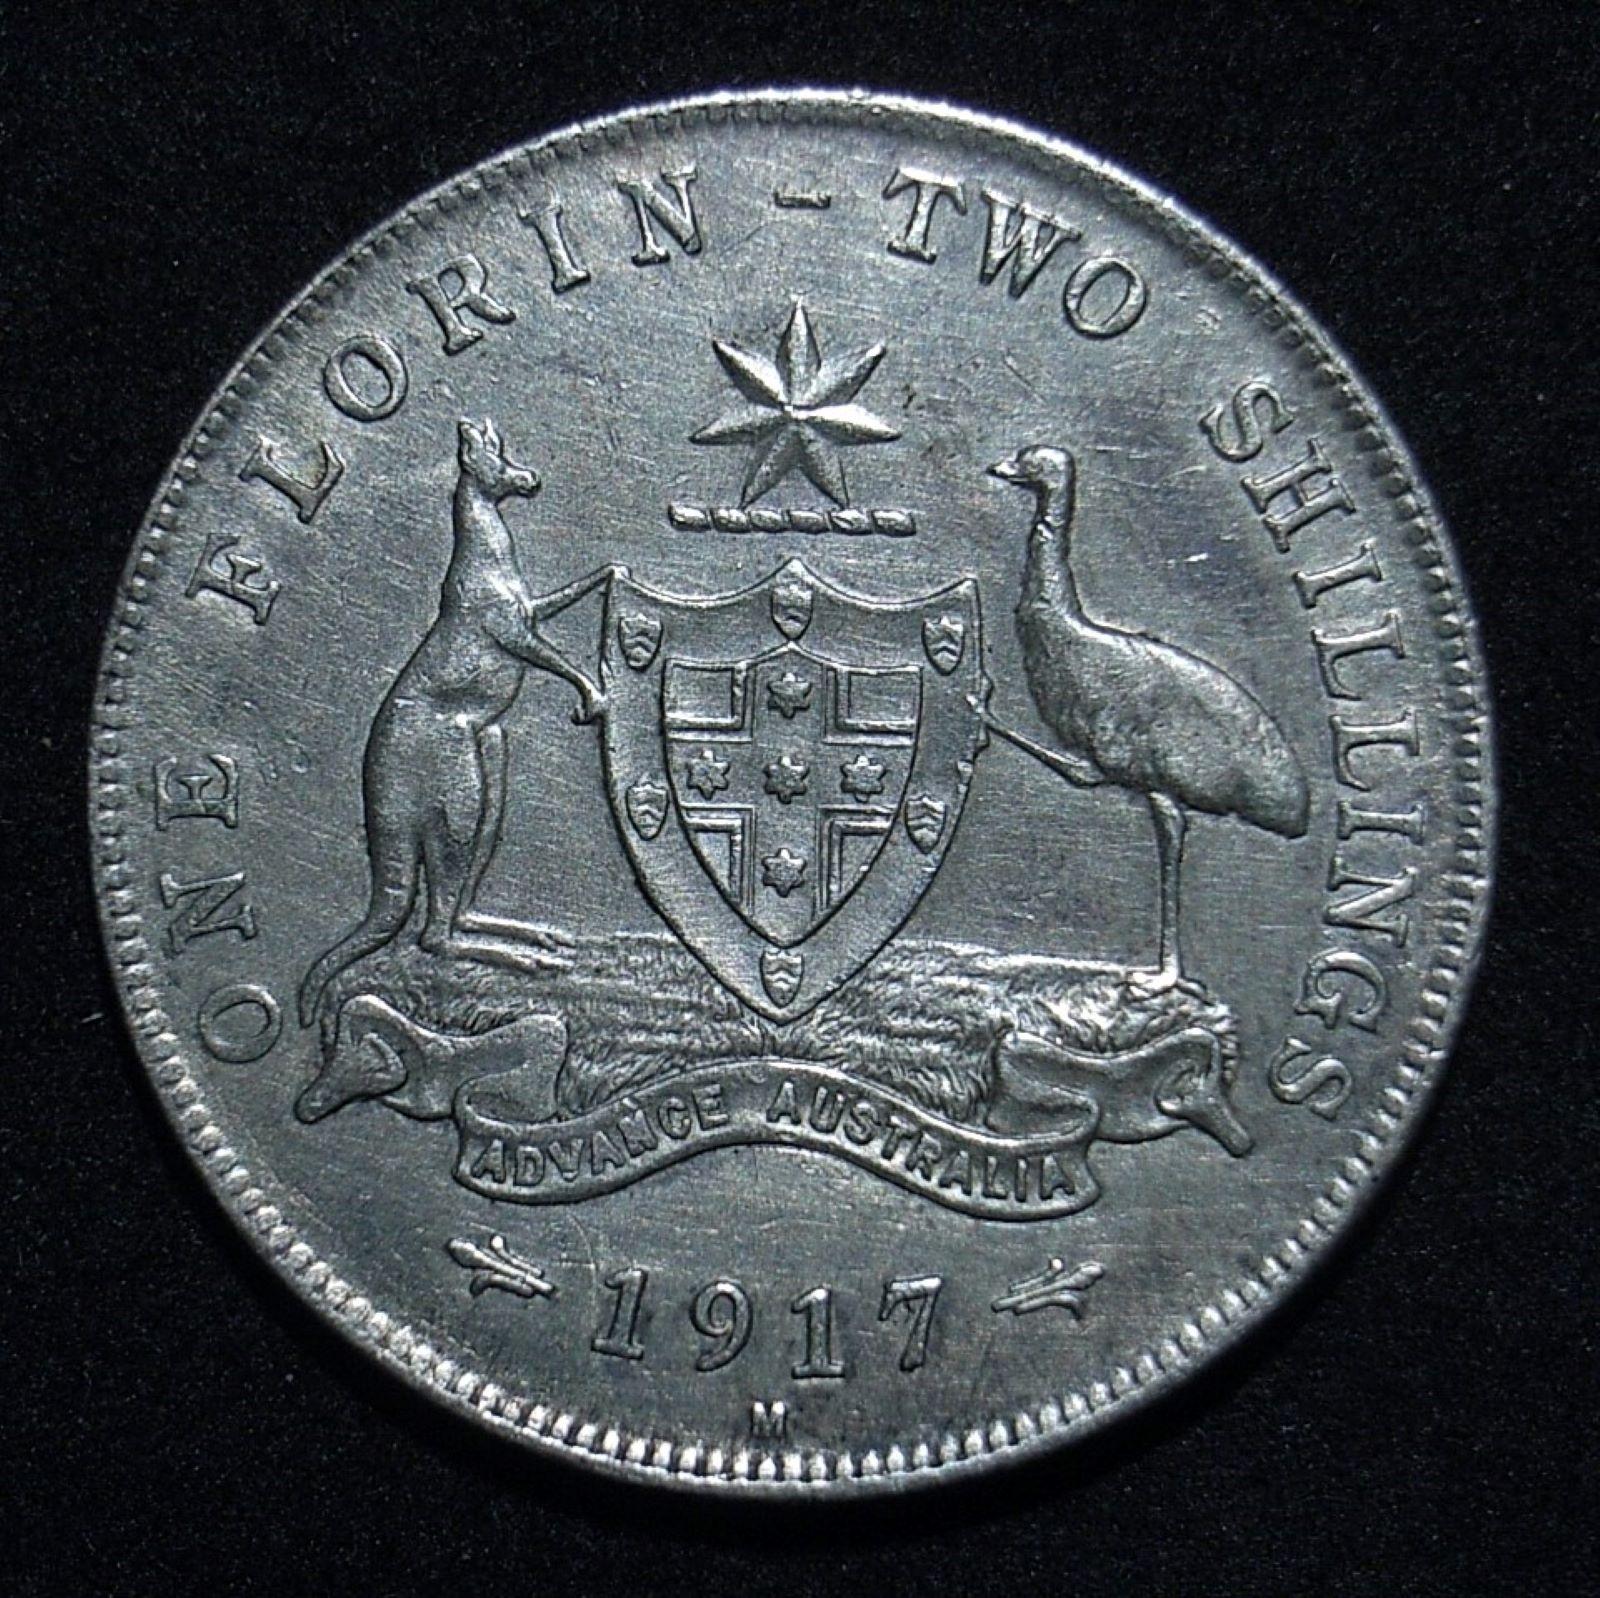 Florin 1917m rev 2